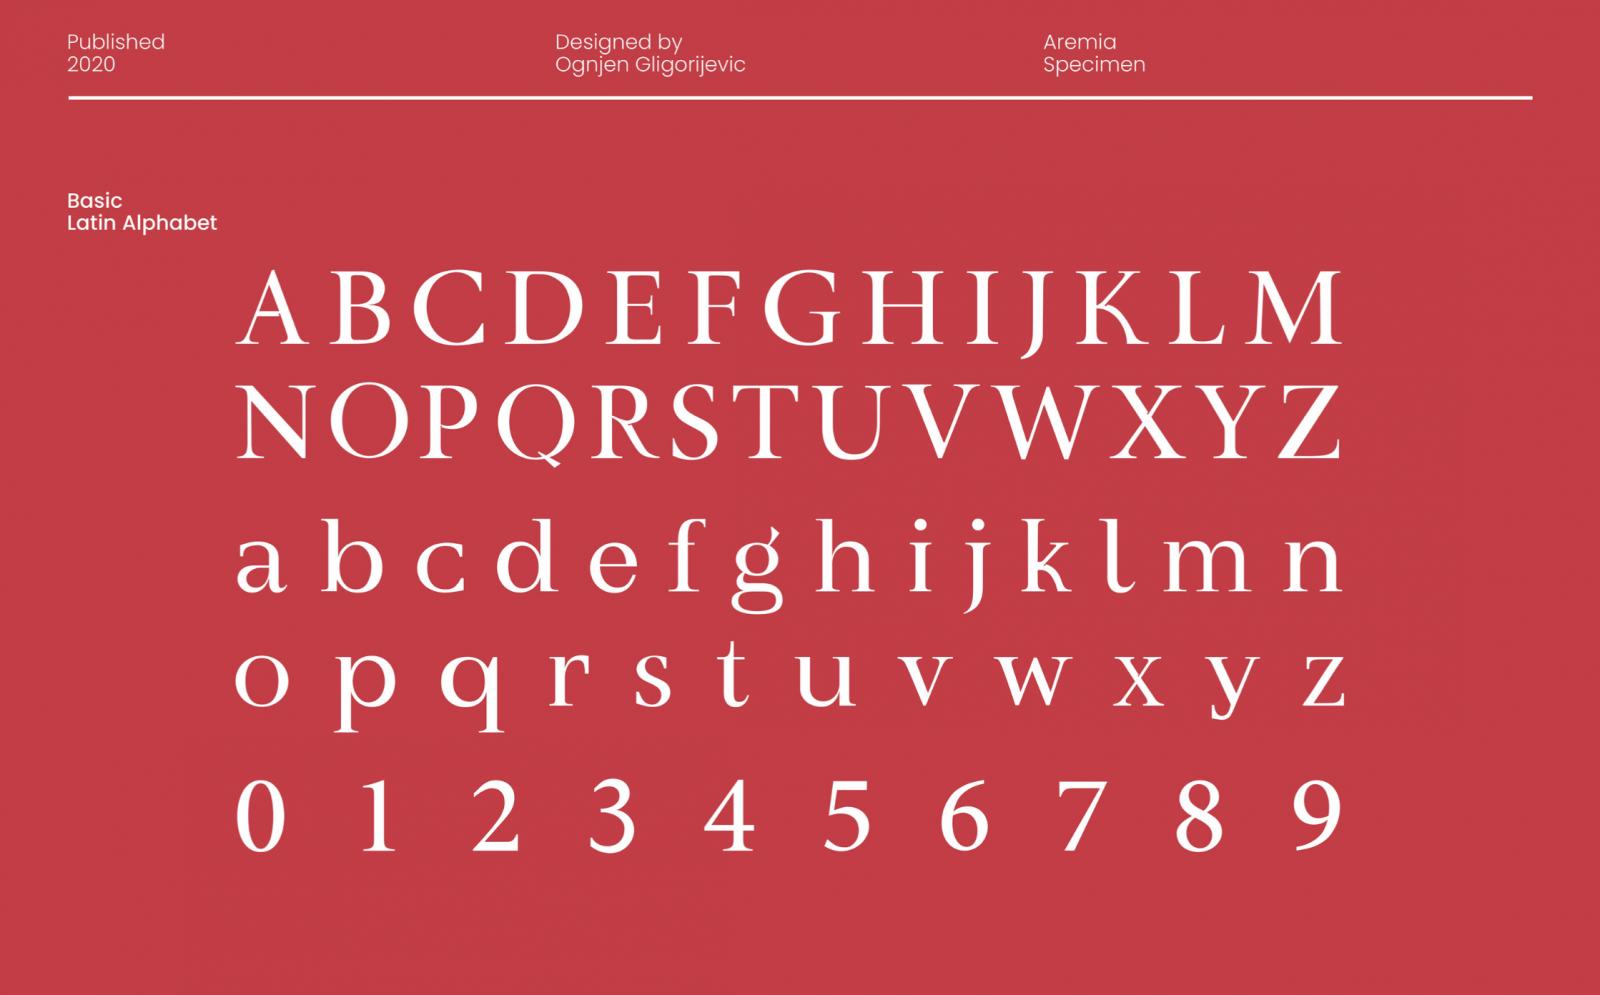 Aremia Typeface Integrates Contemporary Aesthetics to Classic Form